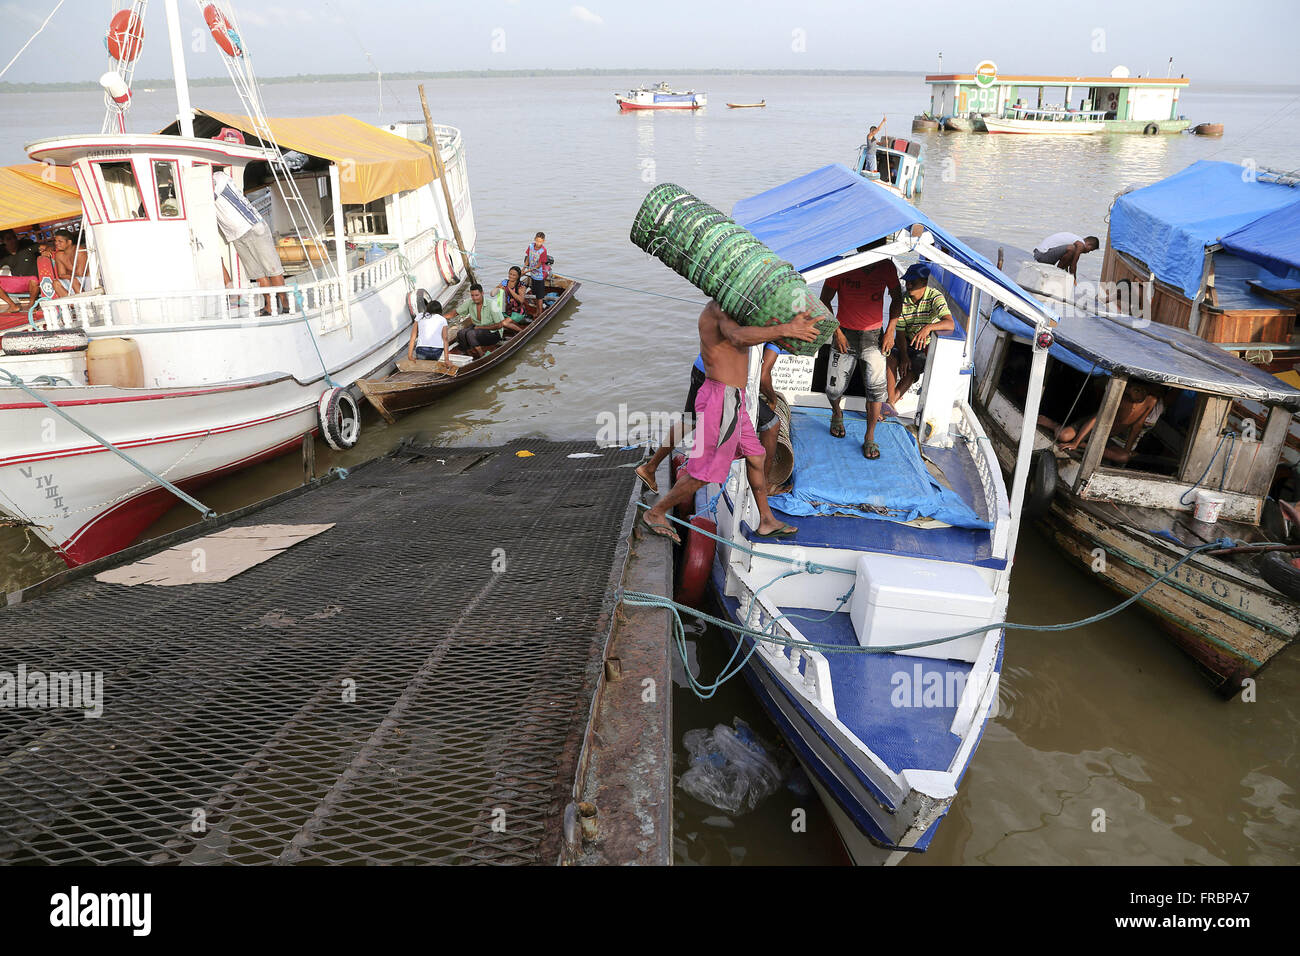 Loading merchandise moored boats near the Fair Acai, Guajará Bay - Stock Image